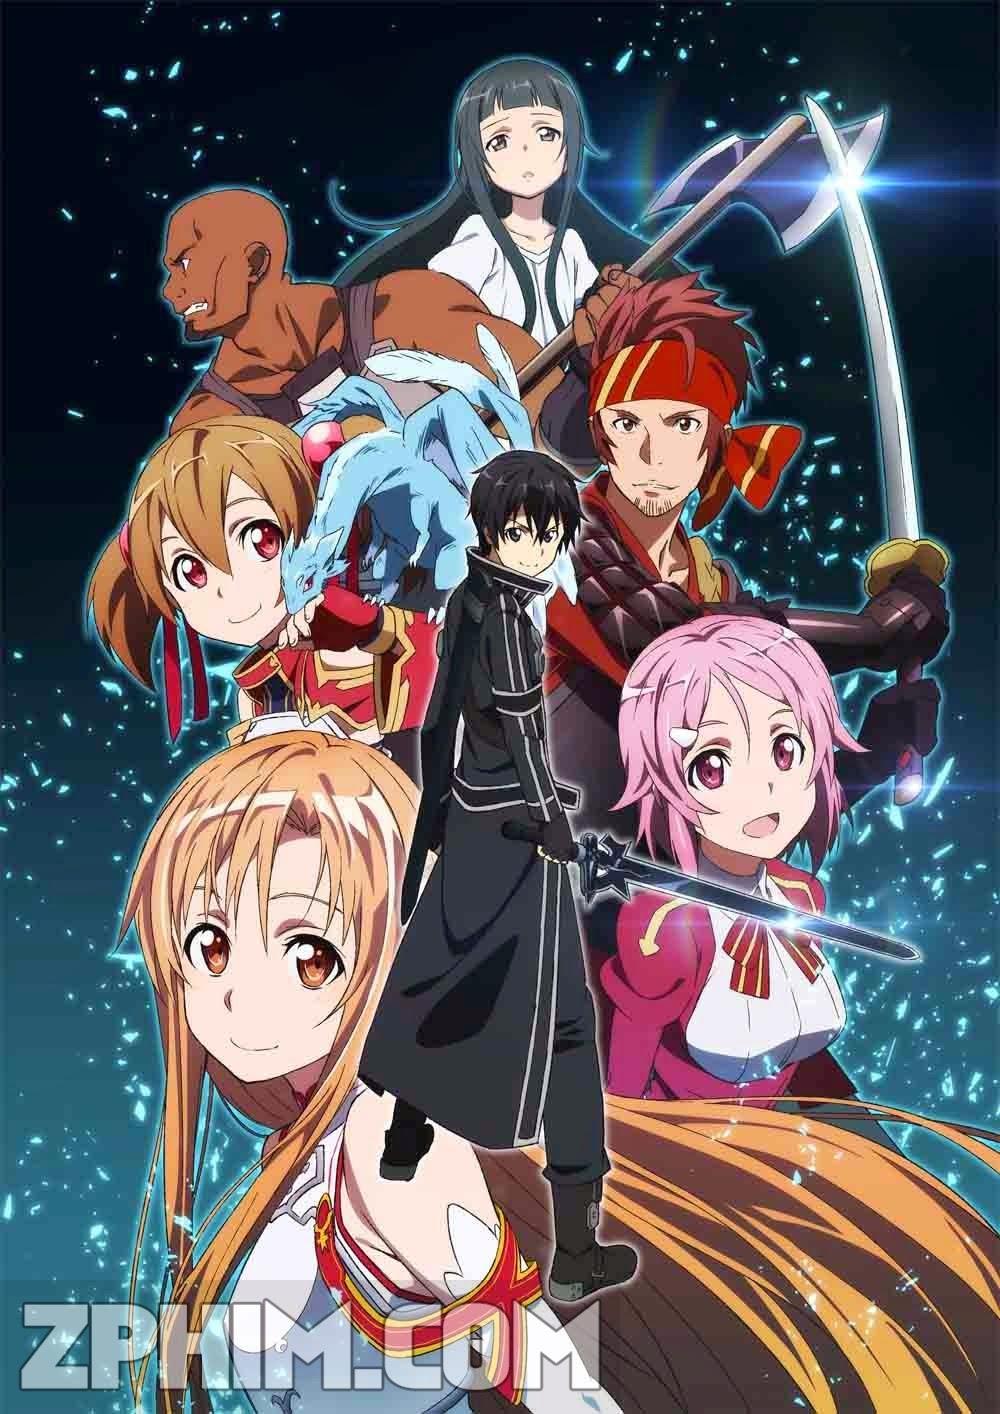 Đao Kiếm Thần Vực - Sword Art Online (2012) Poster